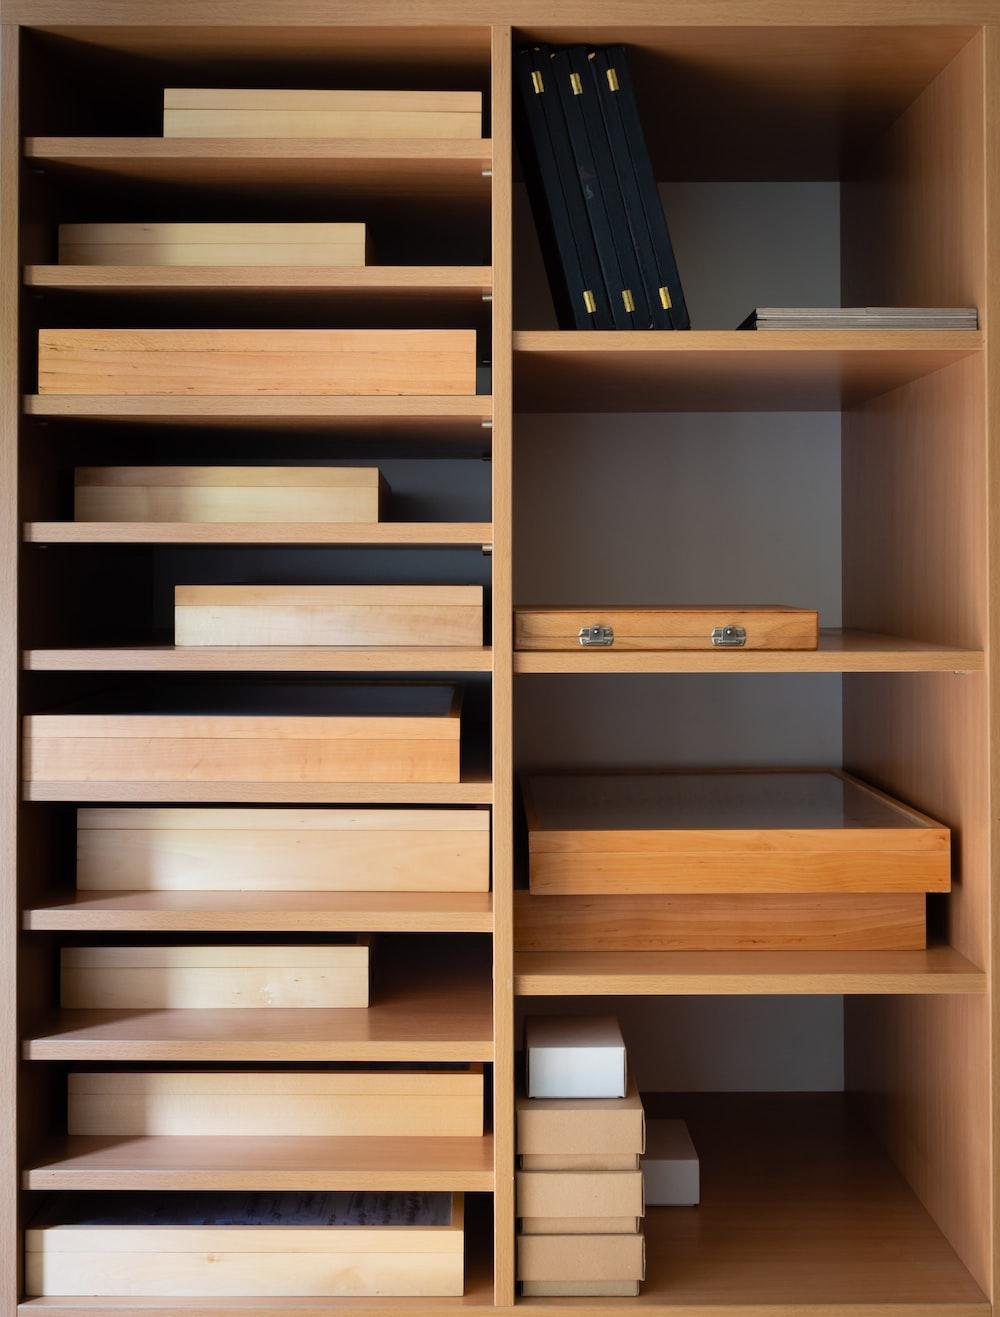 brown wooden shelves